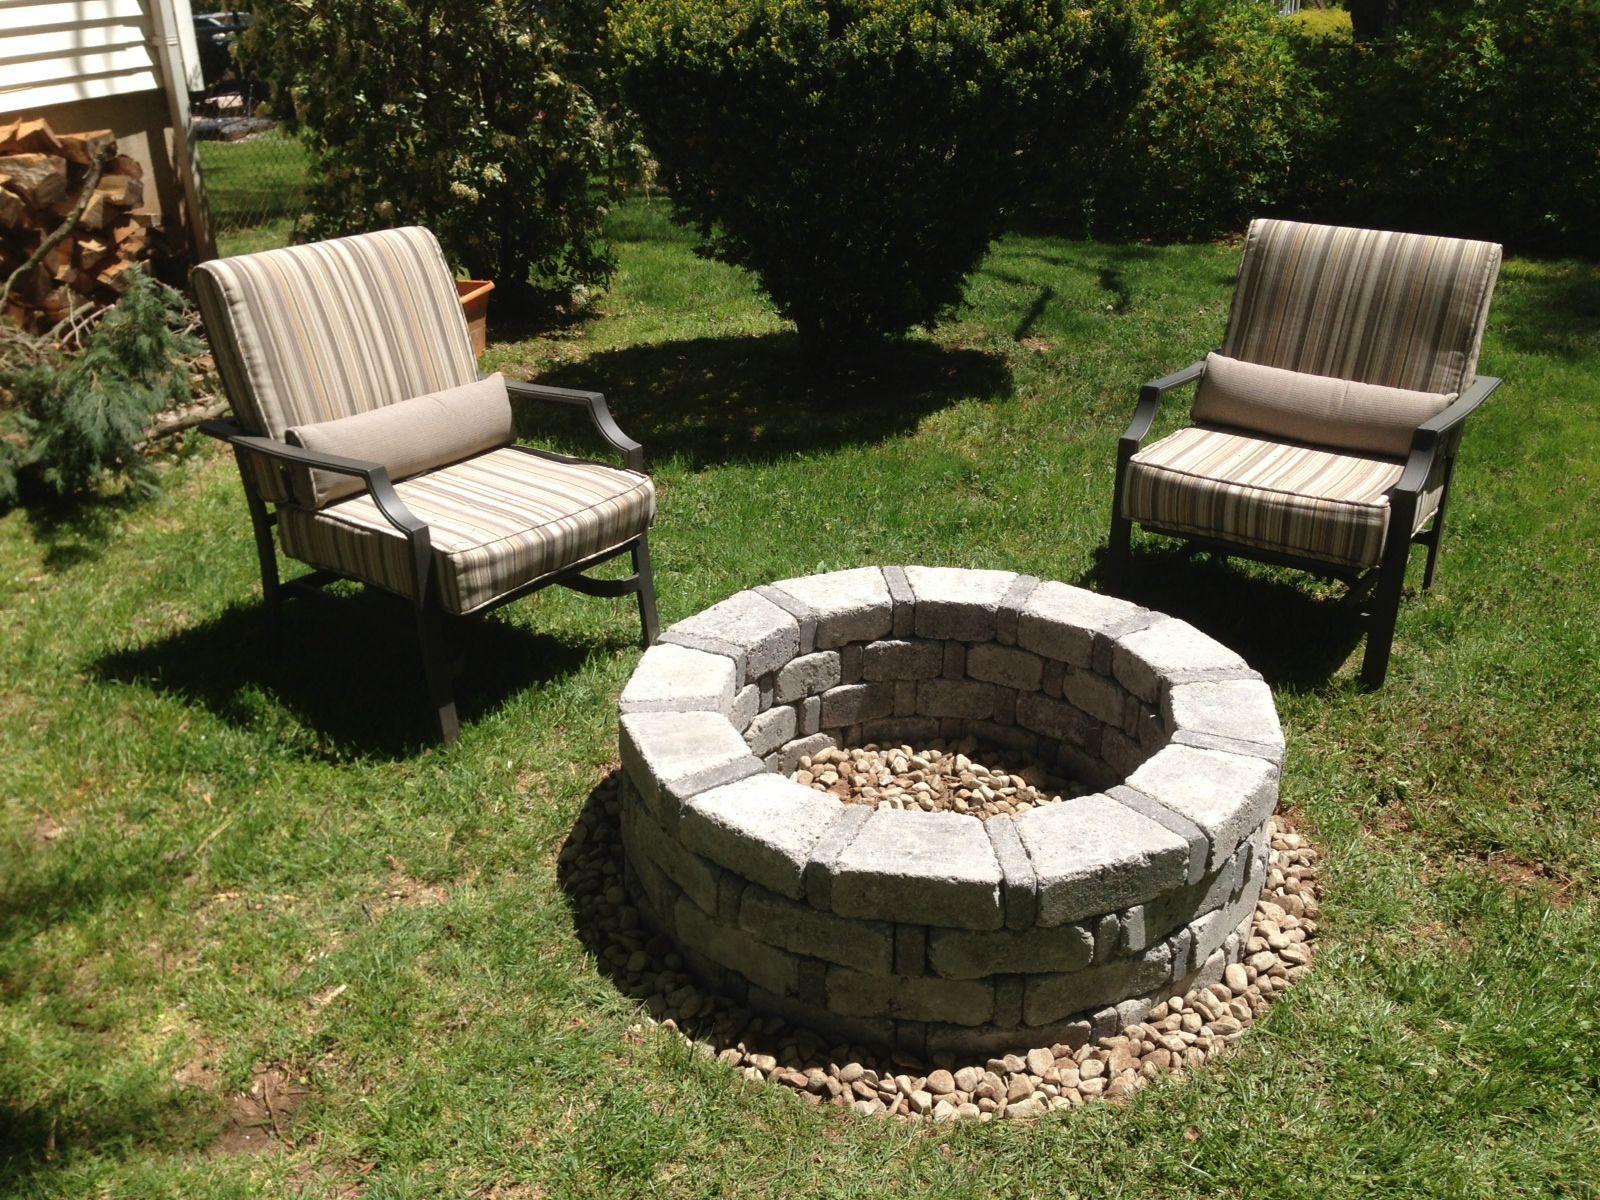 DYI fire pit, so easy | Cheap landscaping ideas, Backyard ...